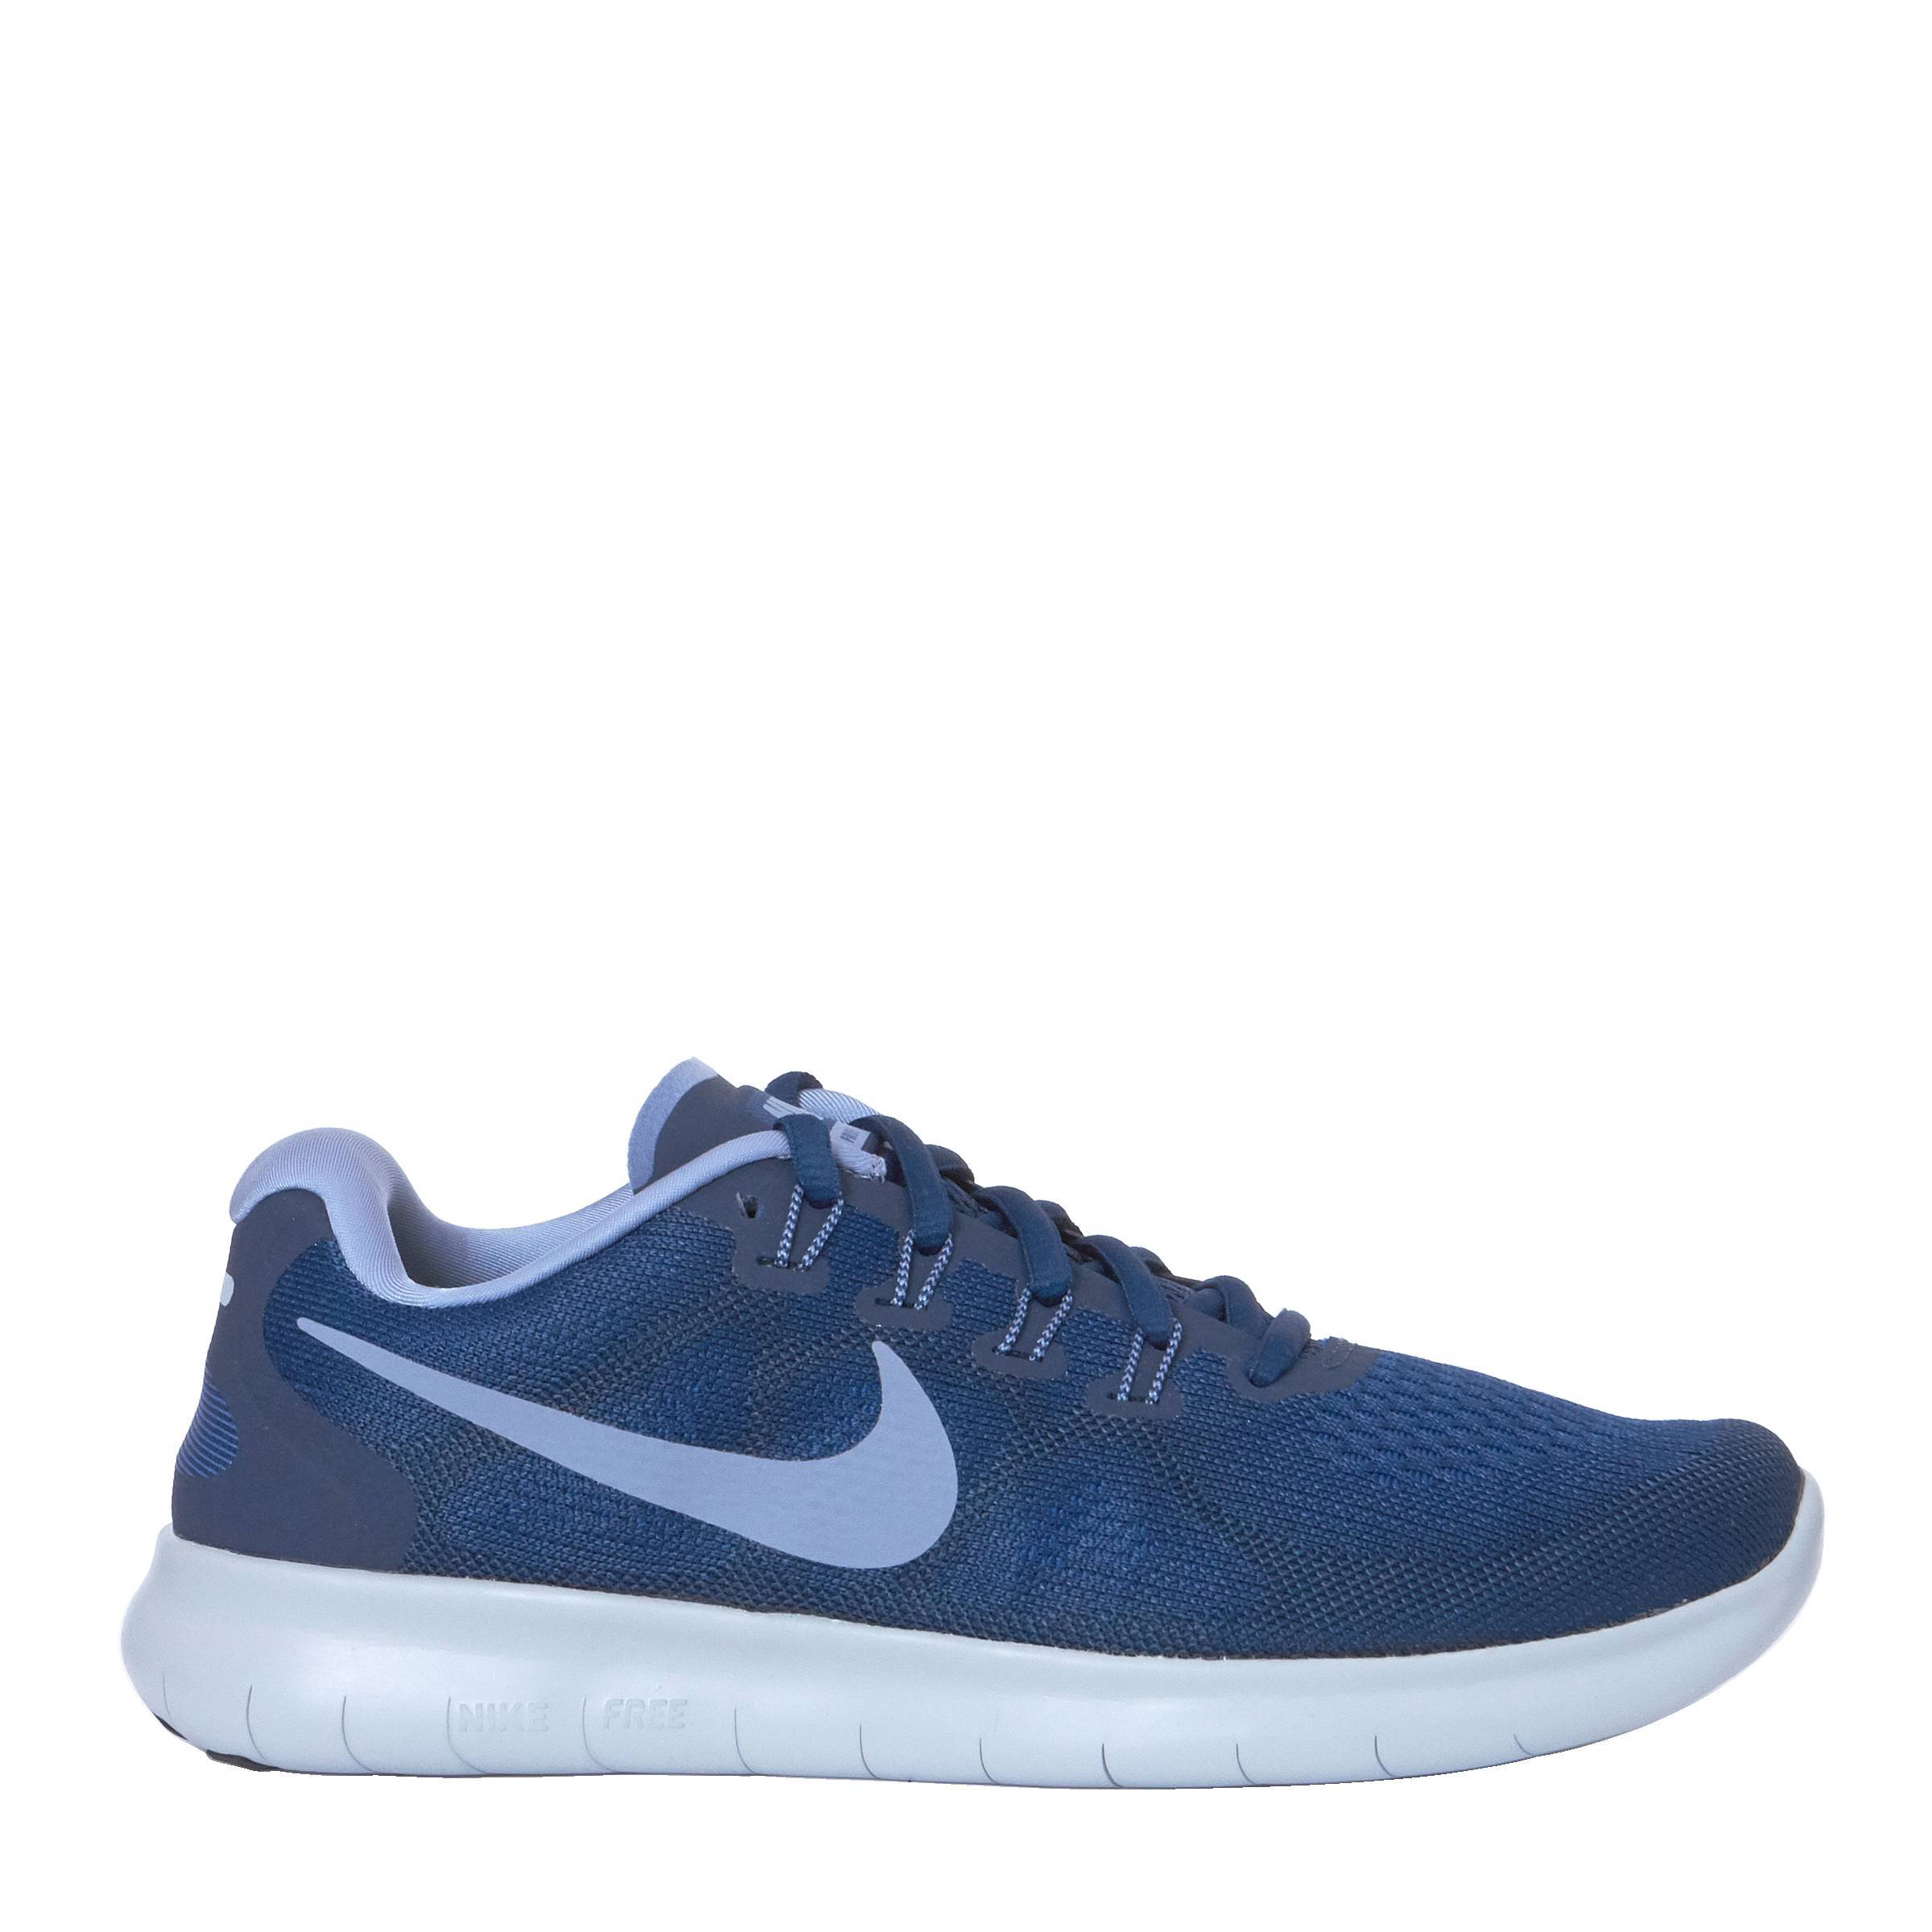 new product 8c36a 4a26e Nike Free Rn 2017 hardloopschoenen  wehkamp